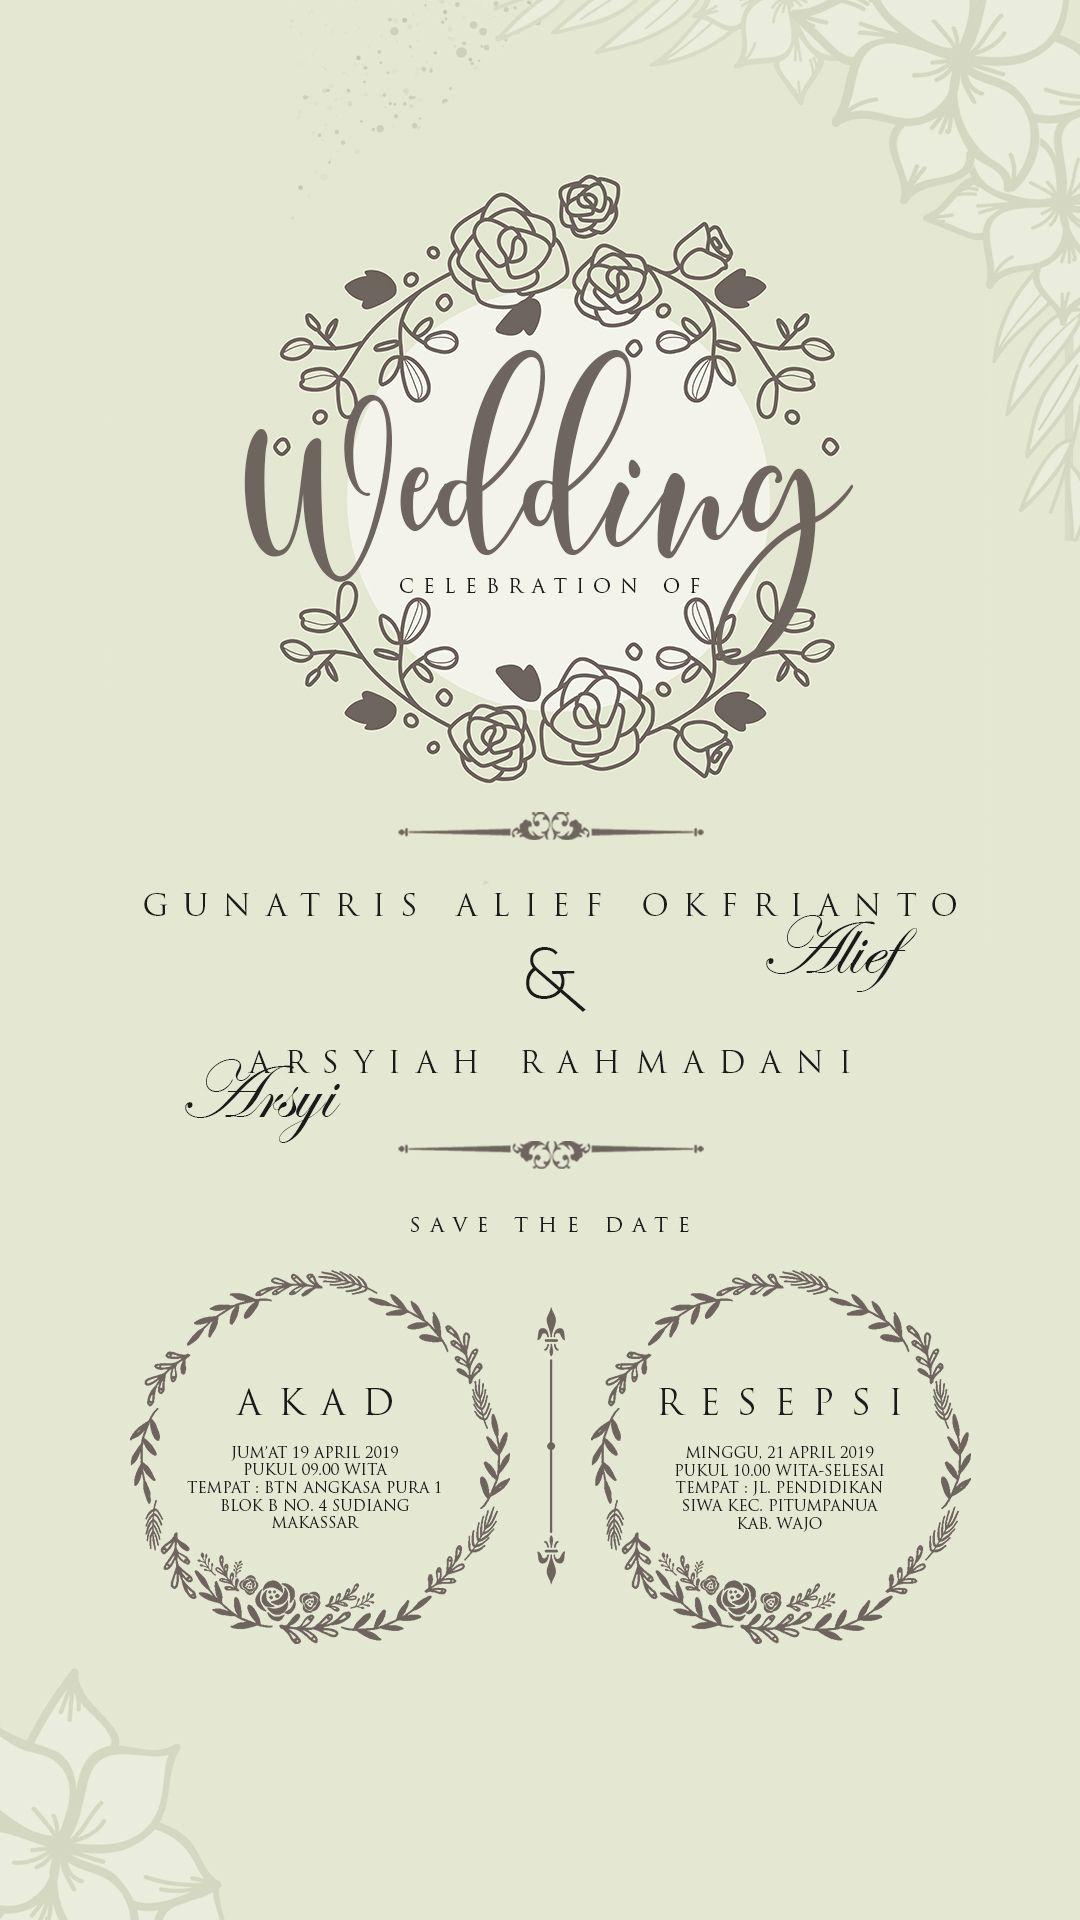 Wedding Invitation Sample Kata Kata Undangan Pernikahan Undangan Pernikahan Desain Undangan Perkawinan